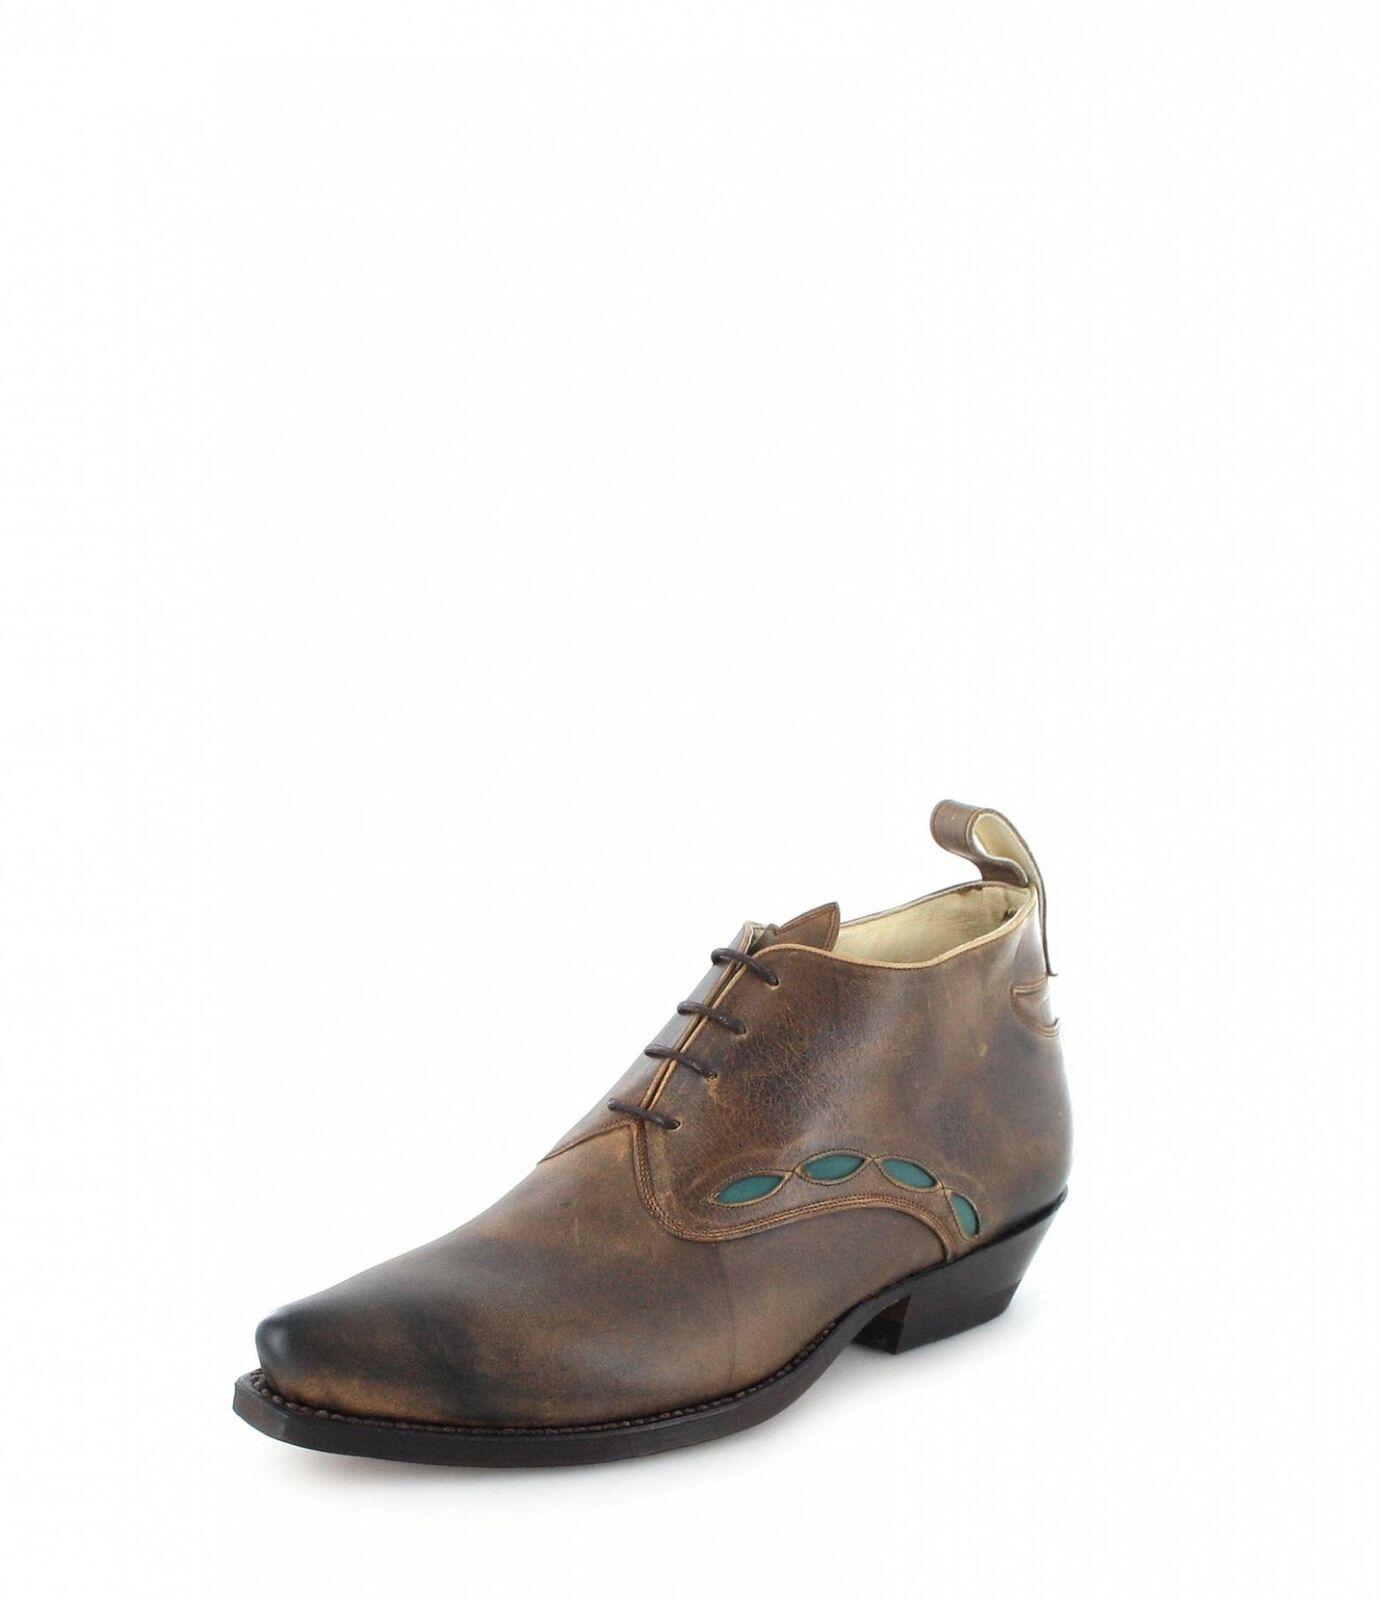 Mulet by Tony mora Stivali zapato Marronee Western Scarpe